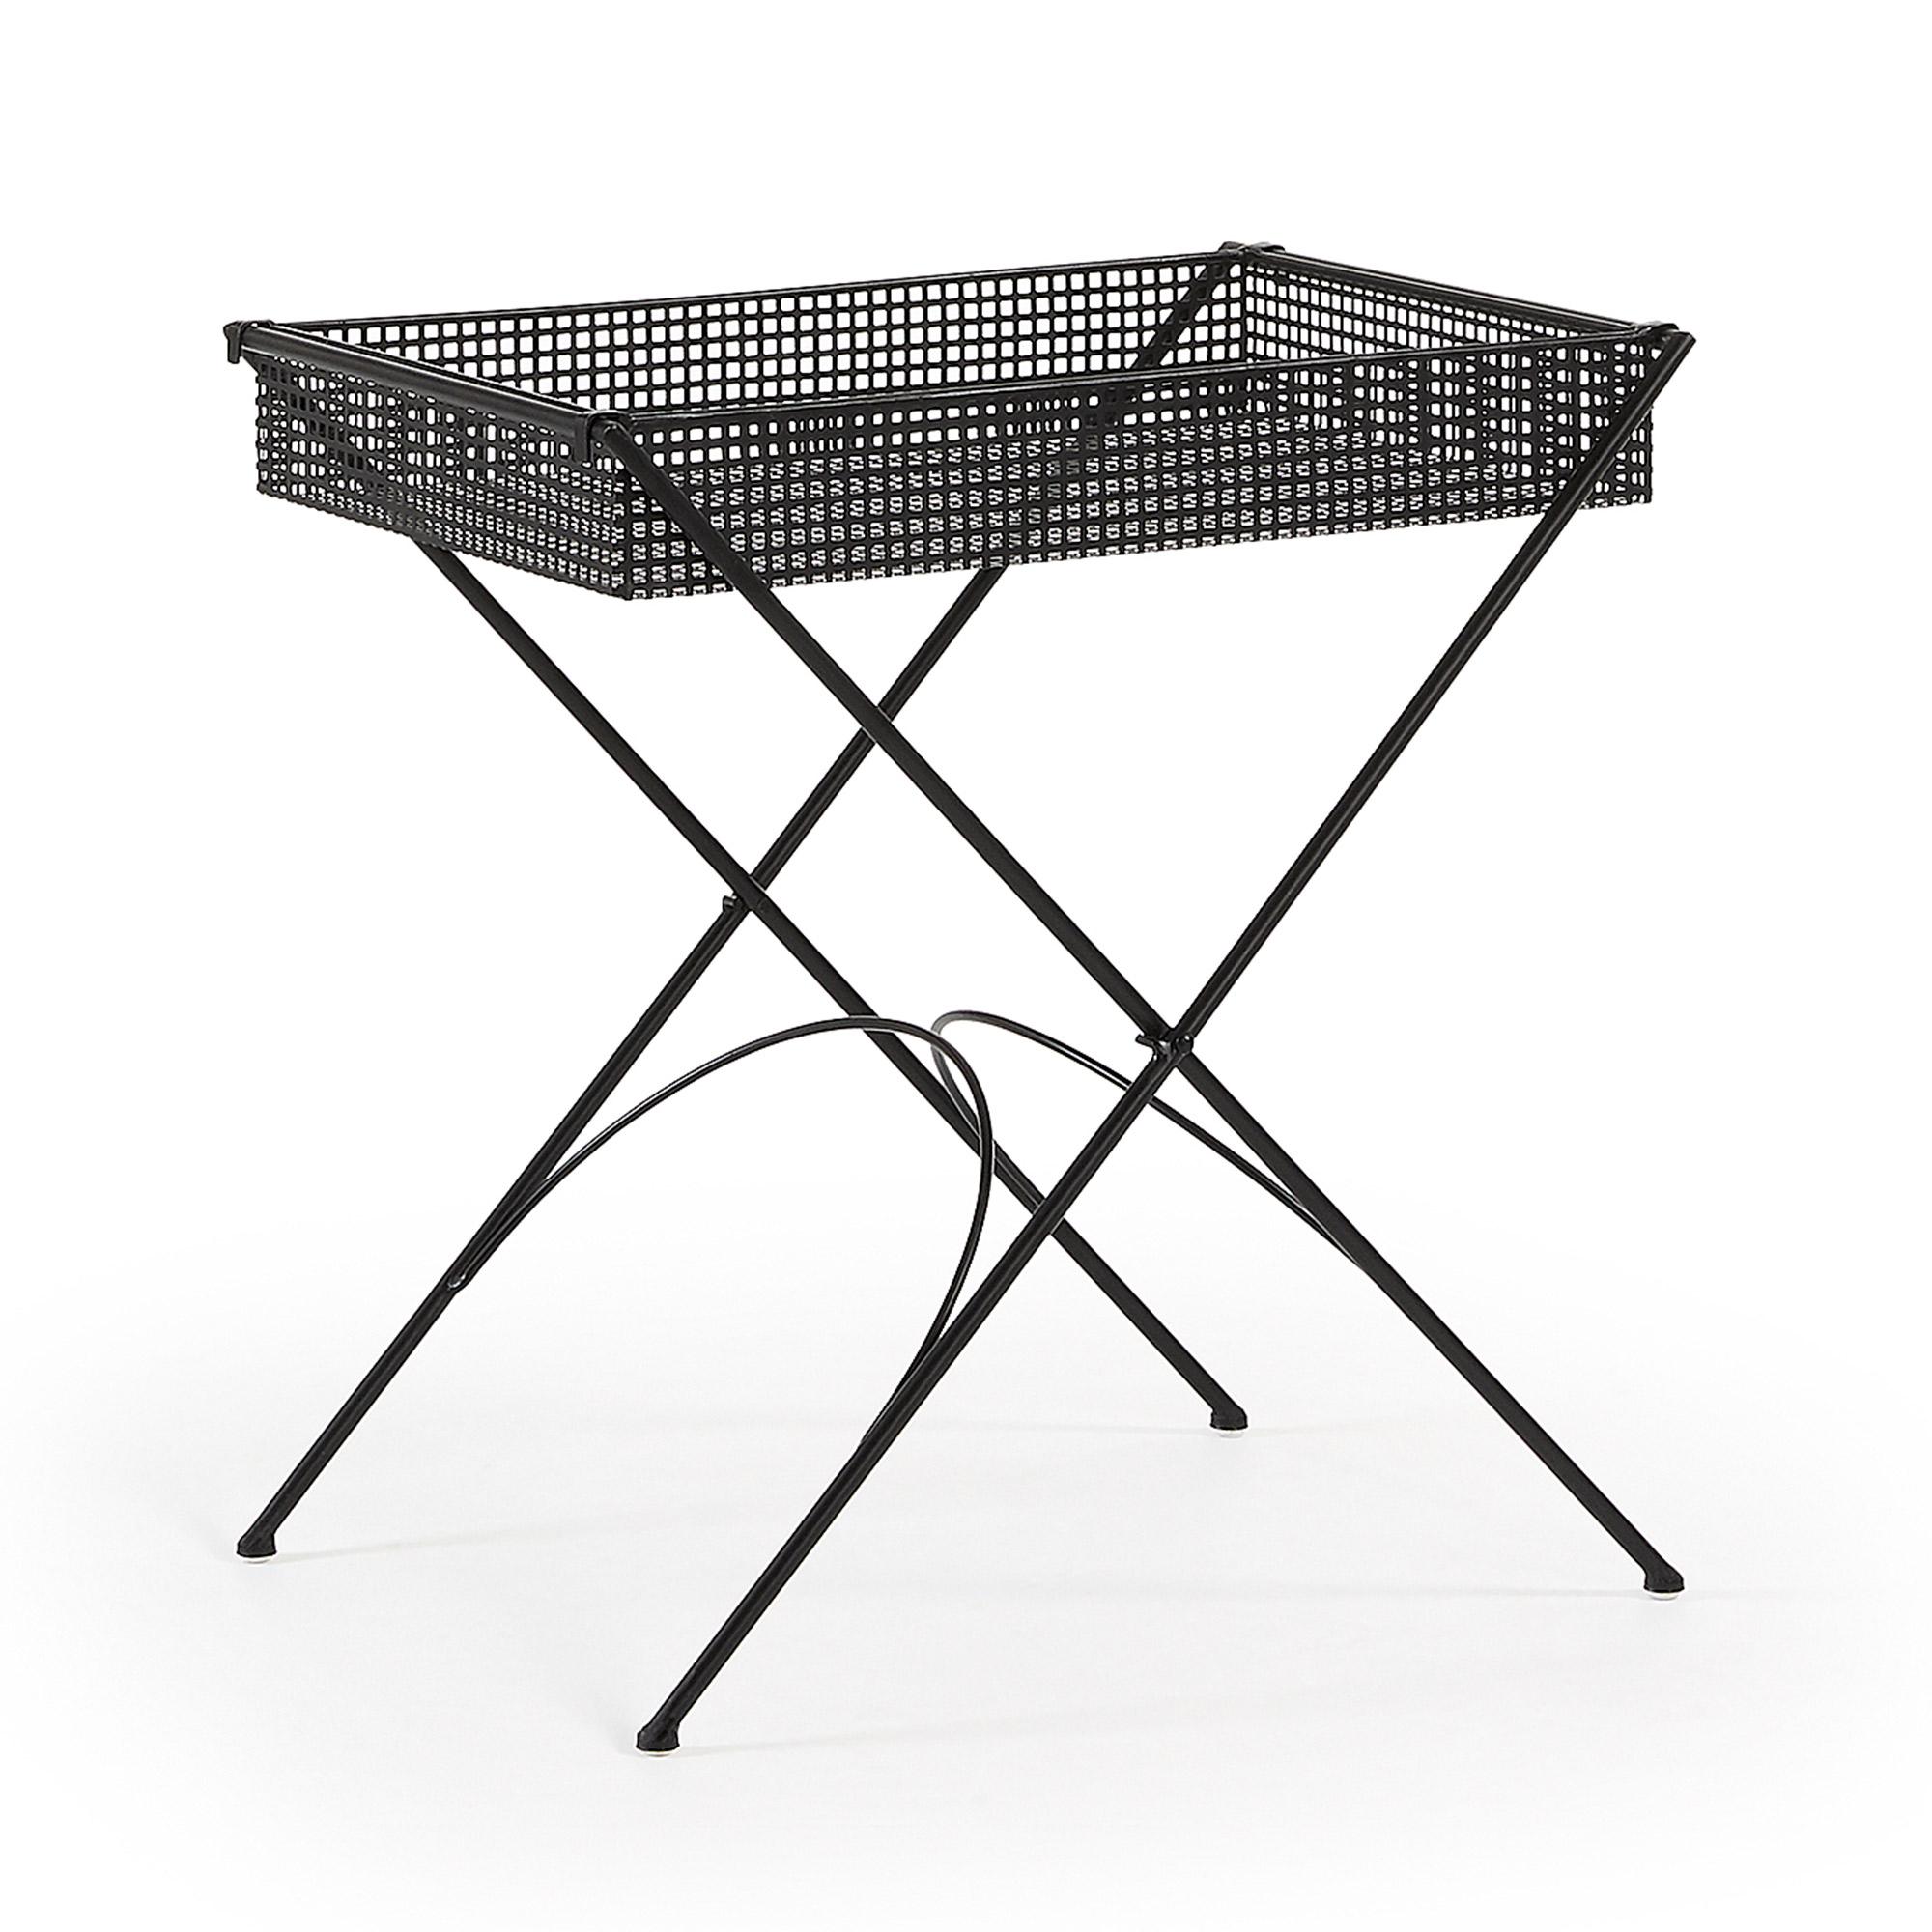 LAFORMA Tulson bakkebord - sort metal, rektangulær